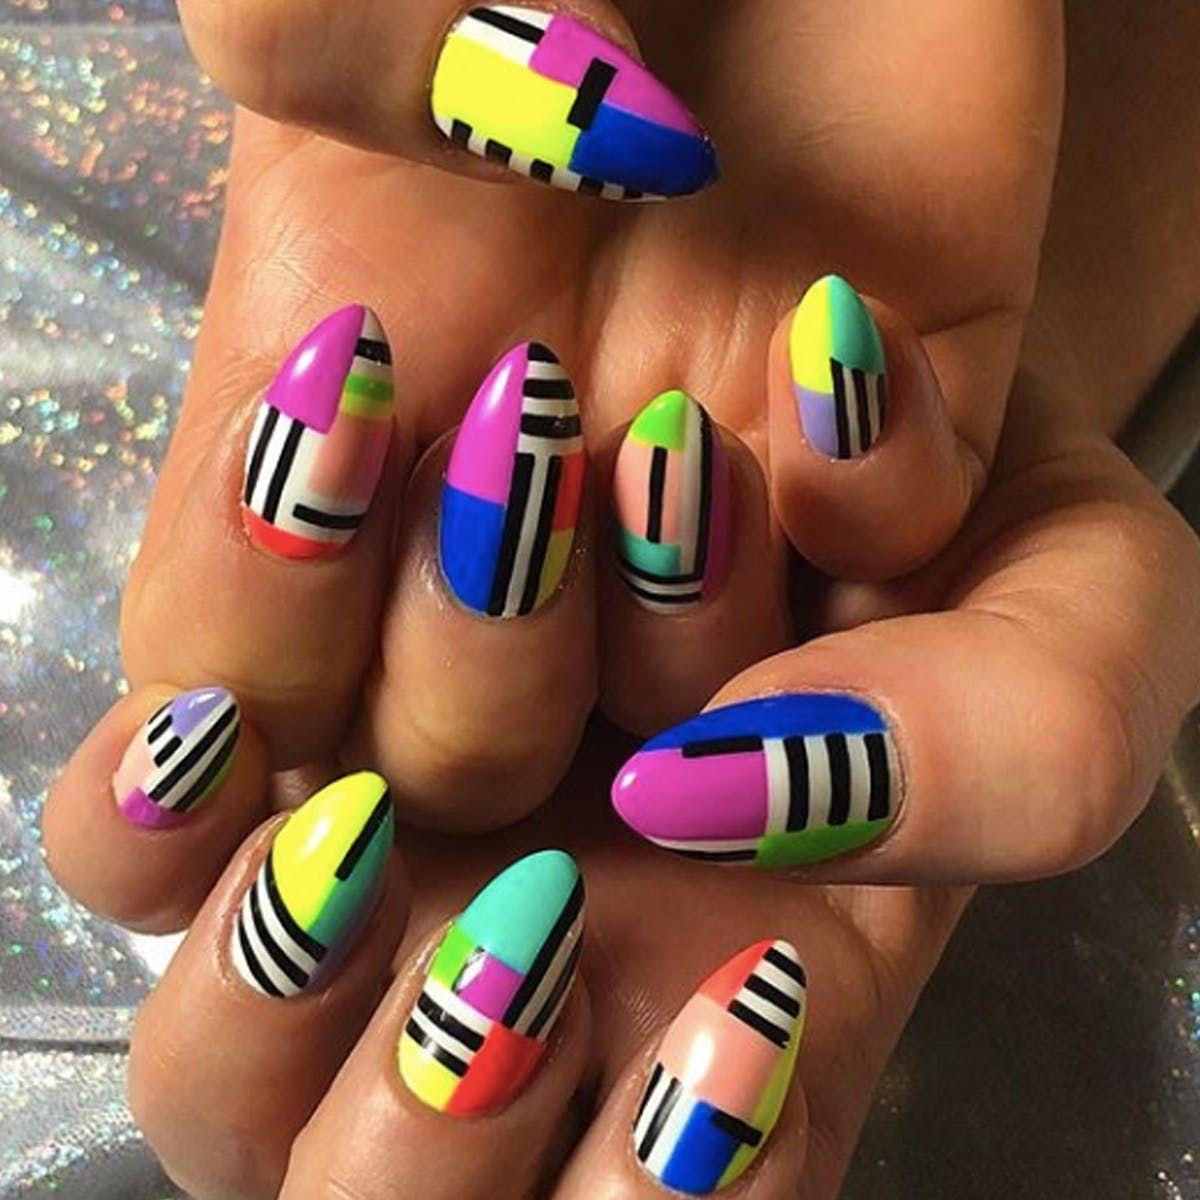 16 Color Block Nail Art Ideas Courtesy Of Instagram Color Block Nails 80s Nails Nail Art Designs